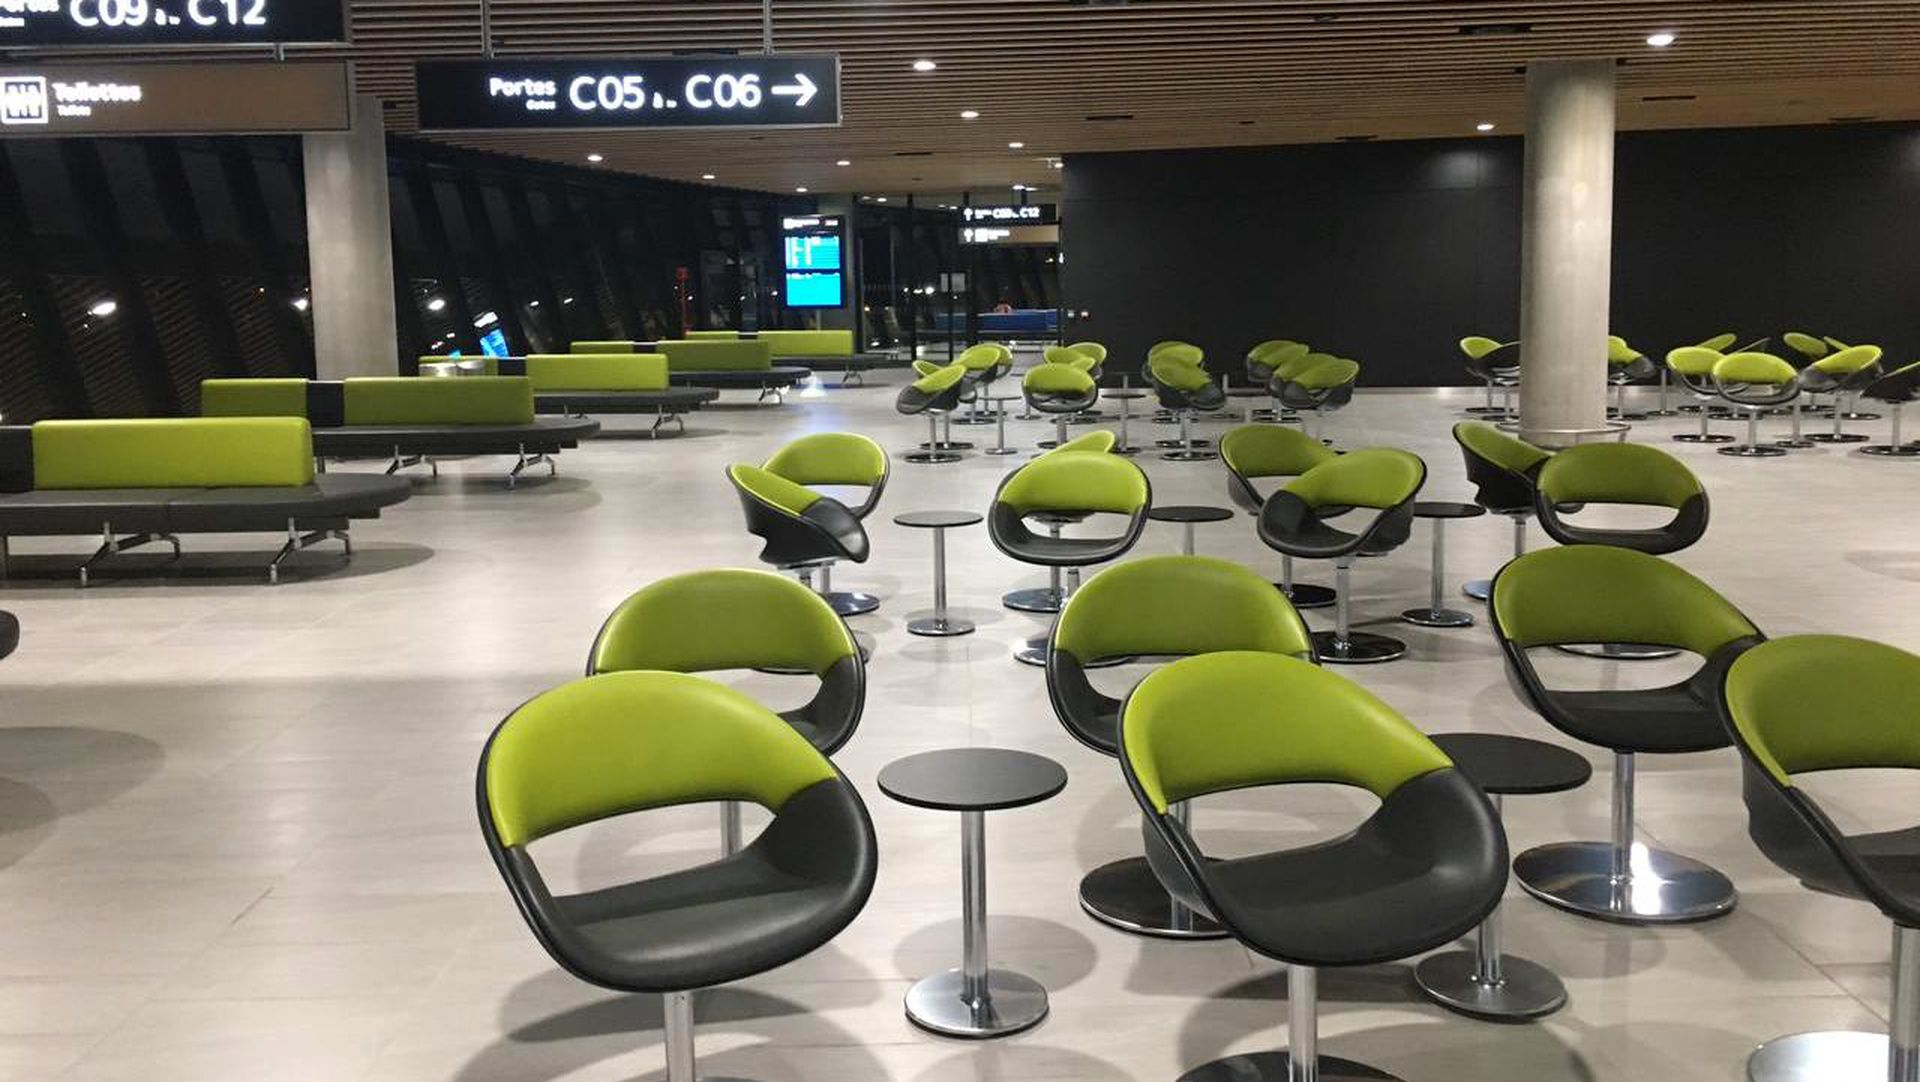 Lyon Saint Exupery Airport Starbucks Seating